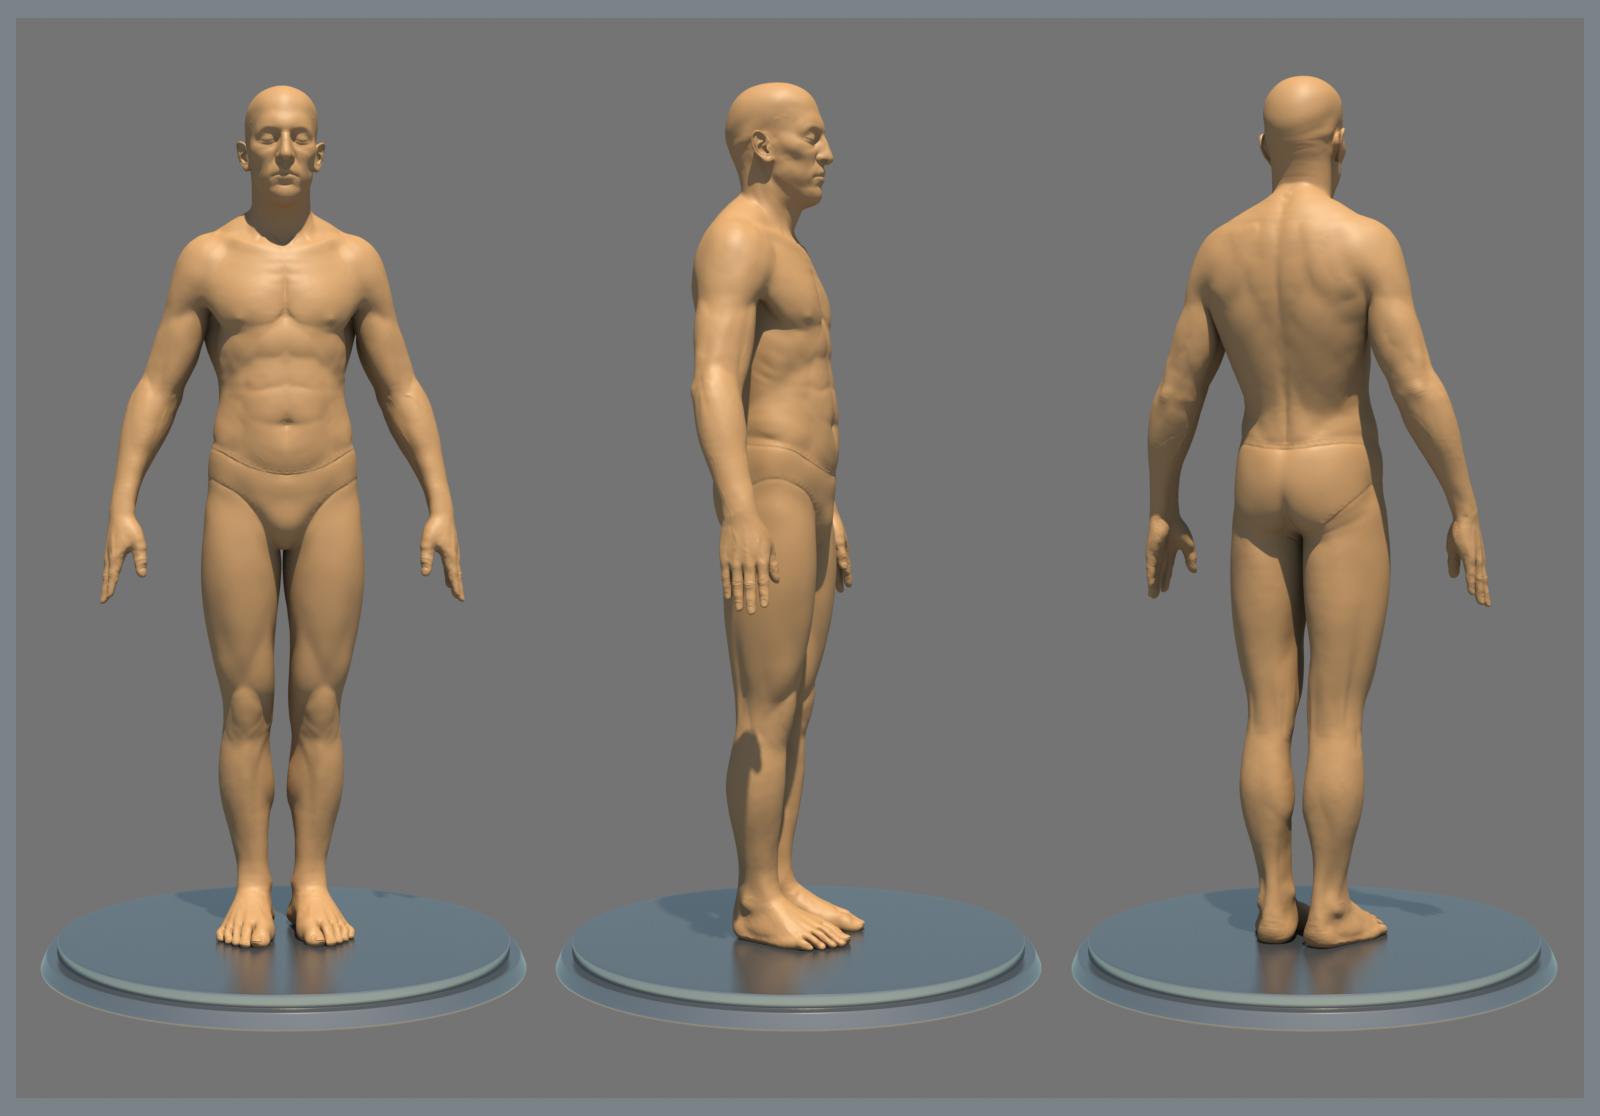 The Anatomy Of Man Gallery - human body anatomy